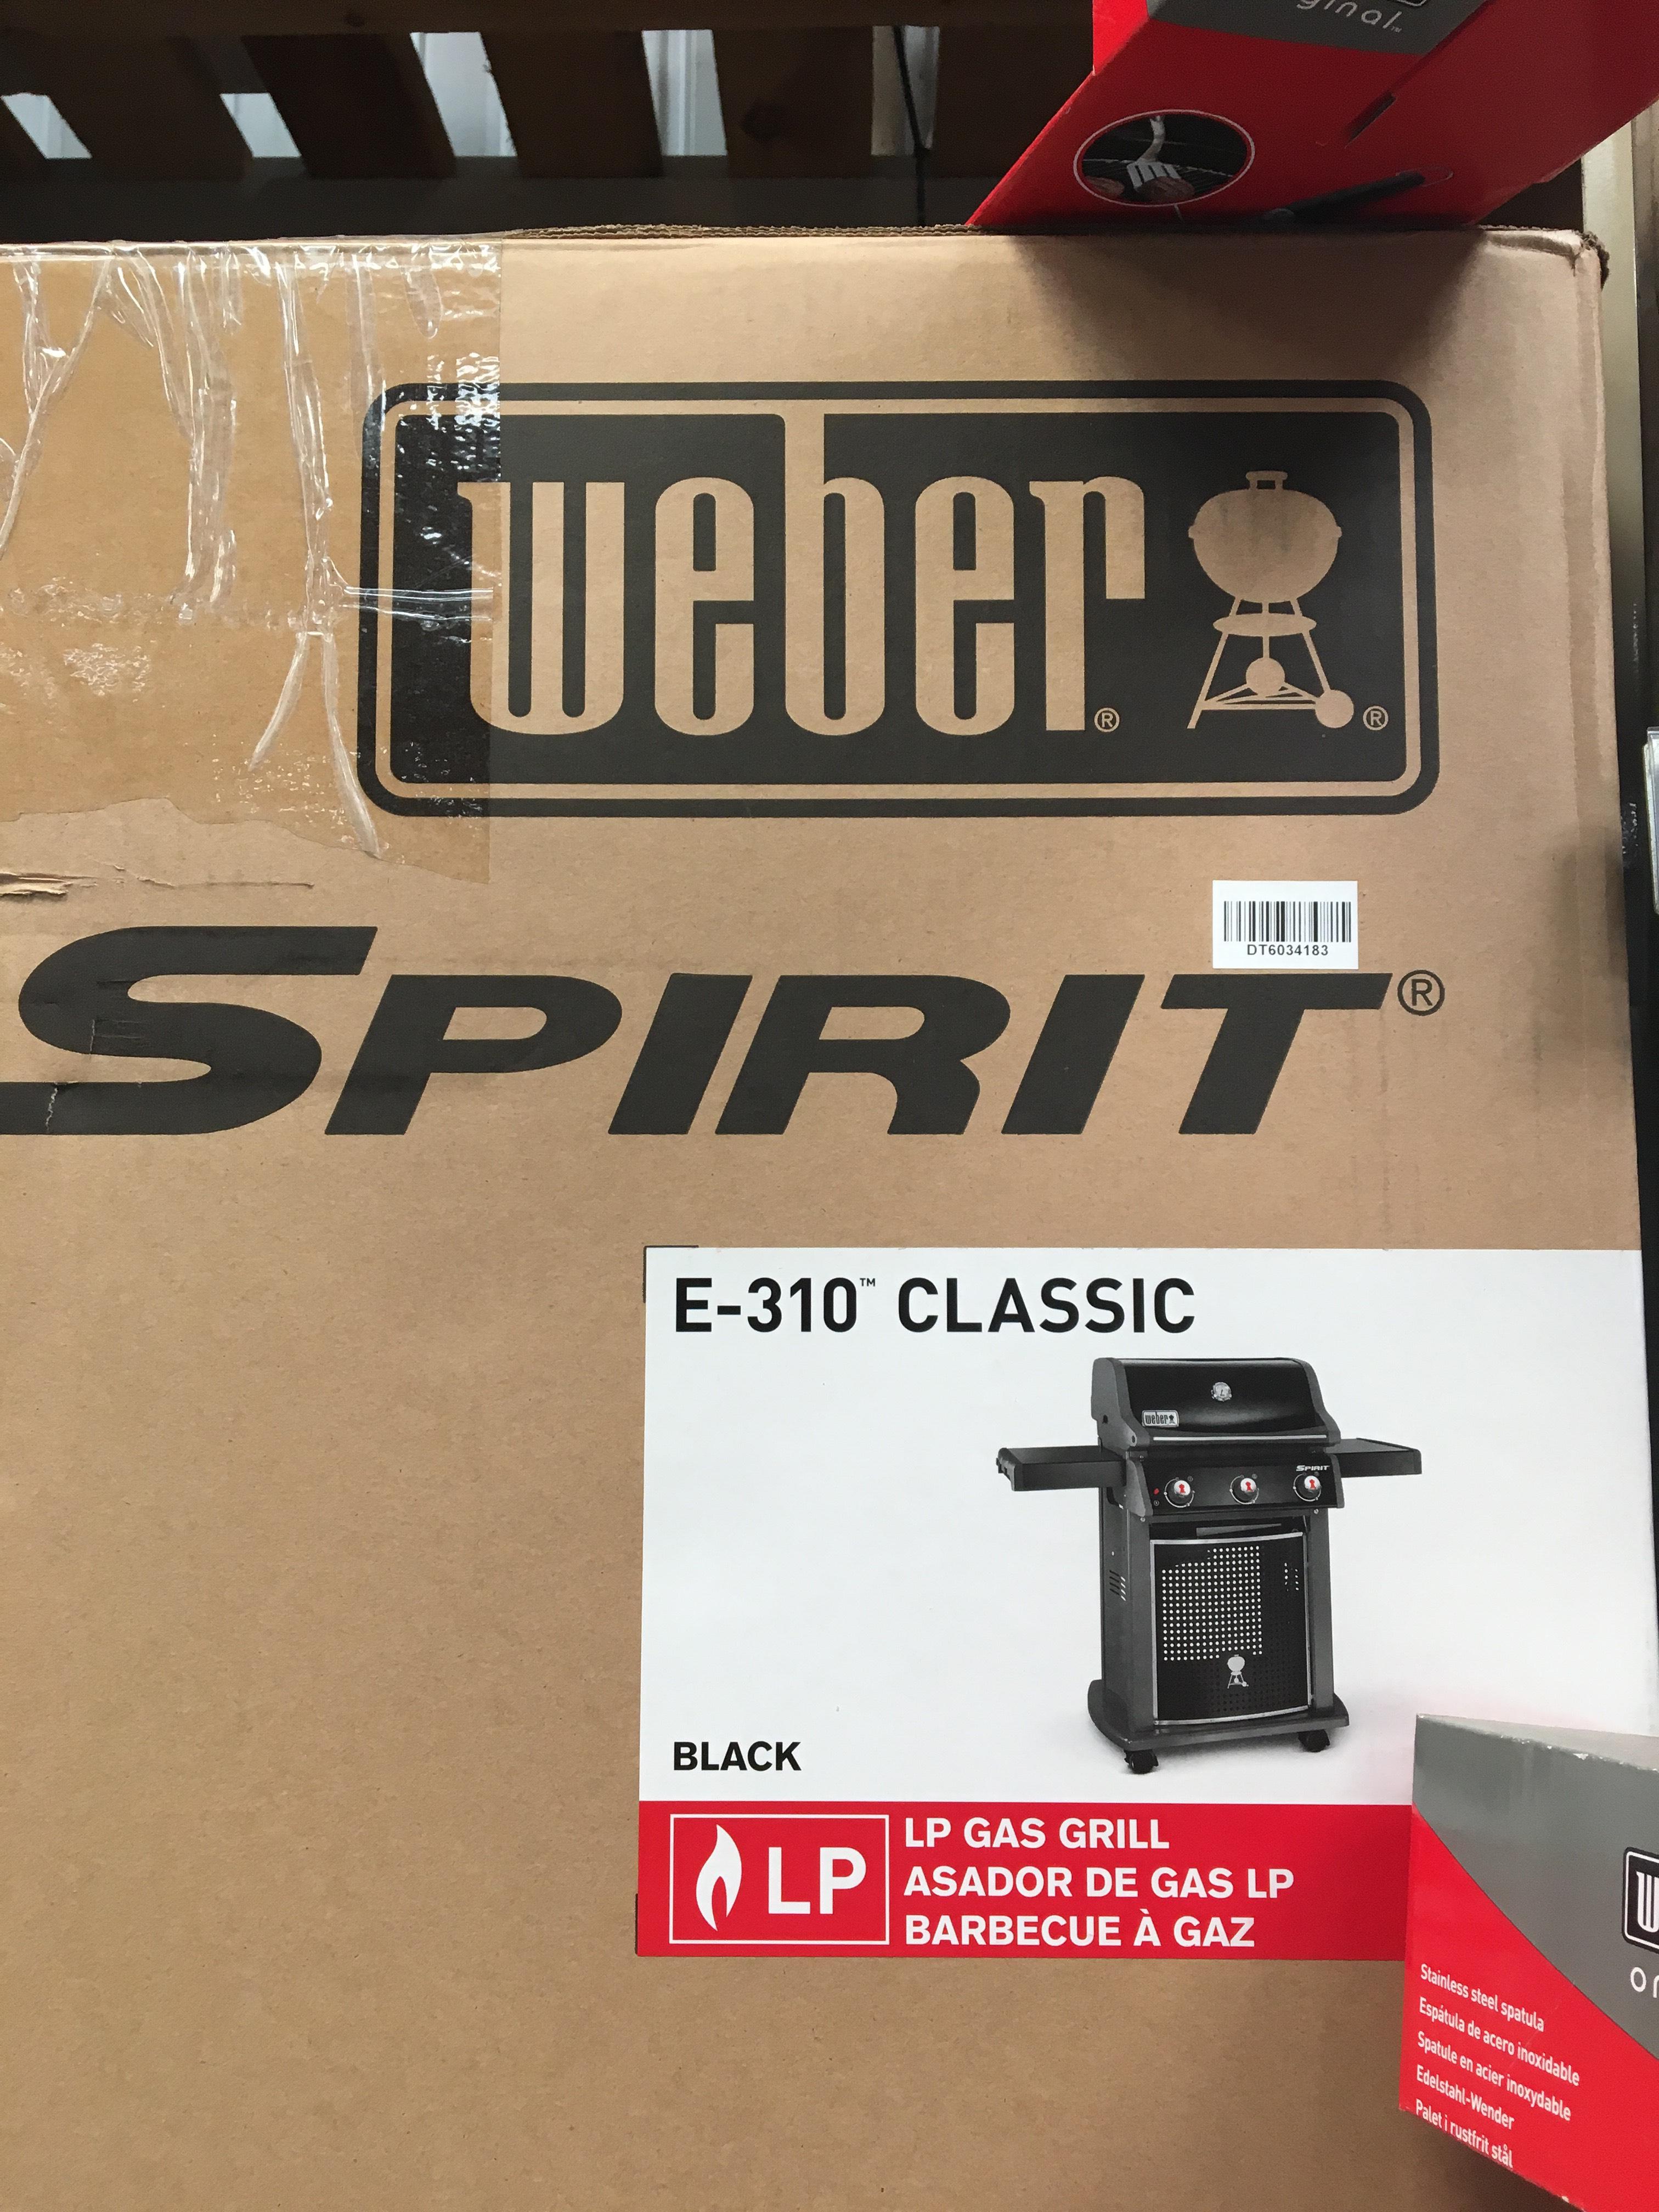 Weber e310 sprit classic 3 burner bbq £200 B&Q ilford